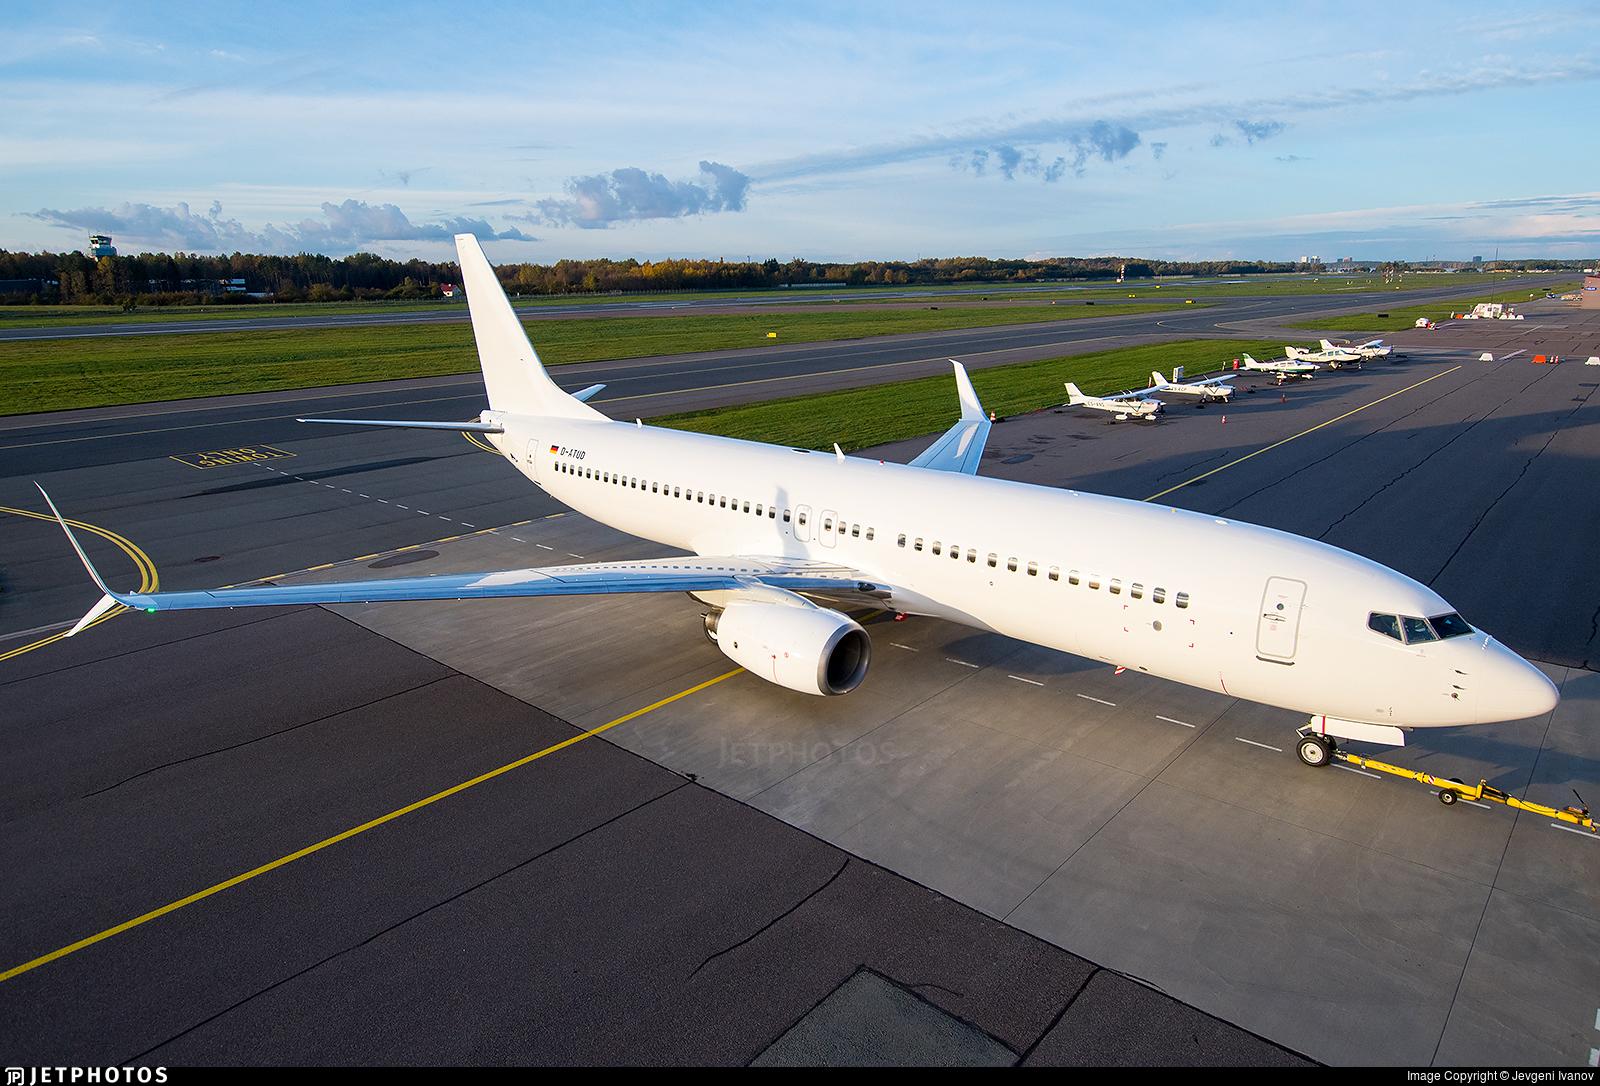 D-ATUD - Boeing 737-8K5 - Untitled